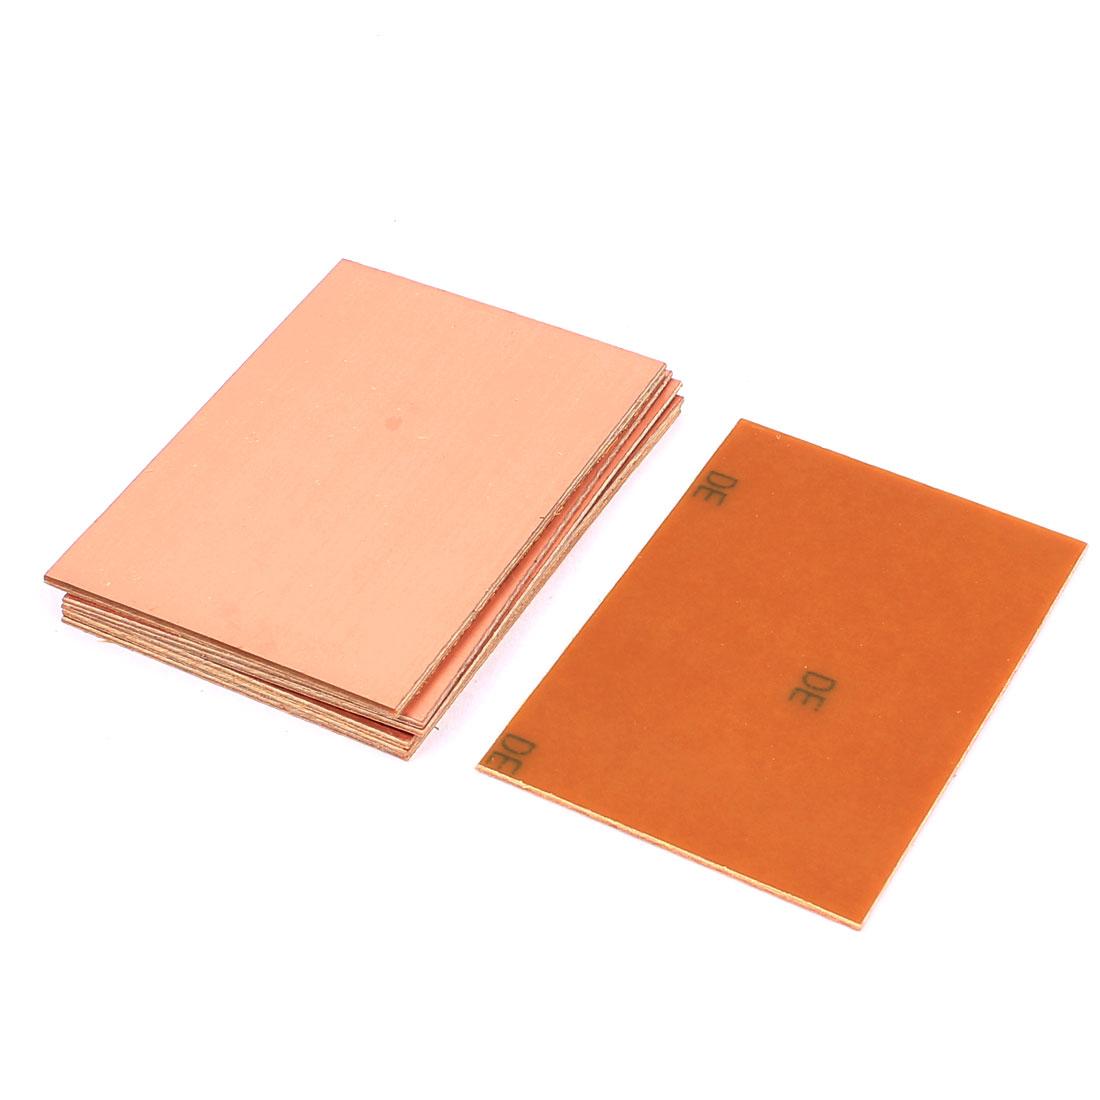 8 Pcs DIY Single Side Copper Plated Prototype Paper PCB Board 10cmx7cm